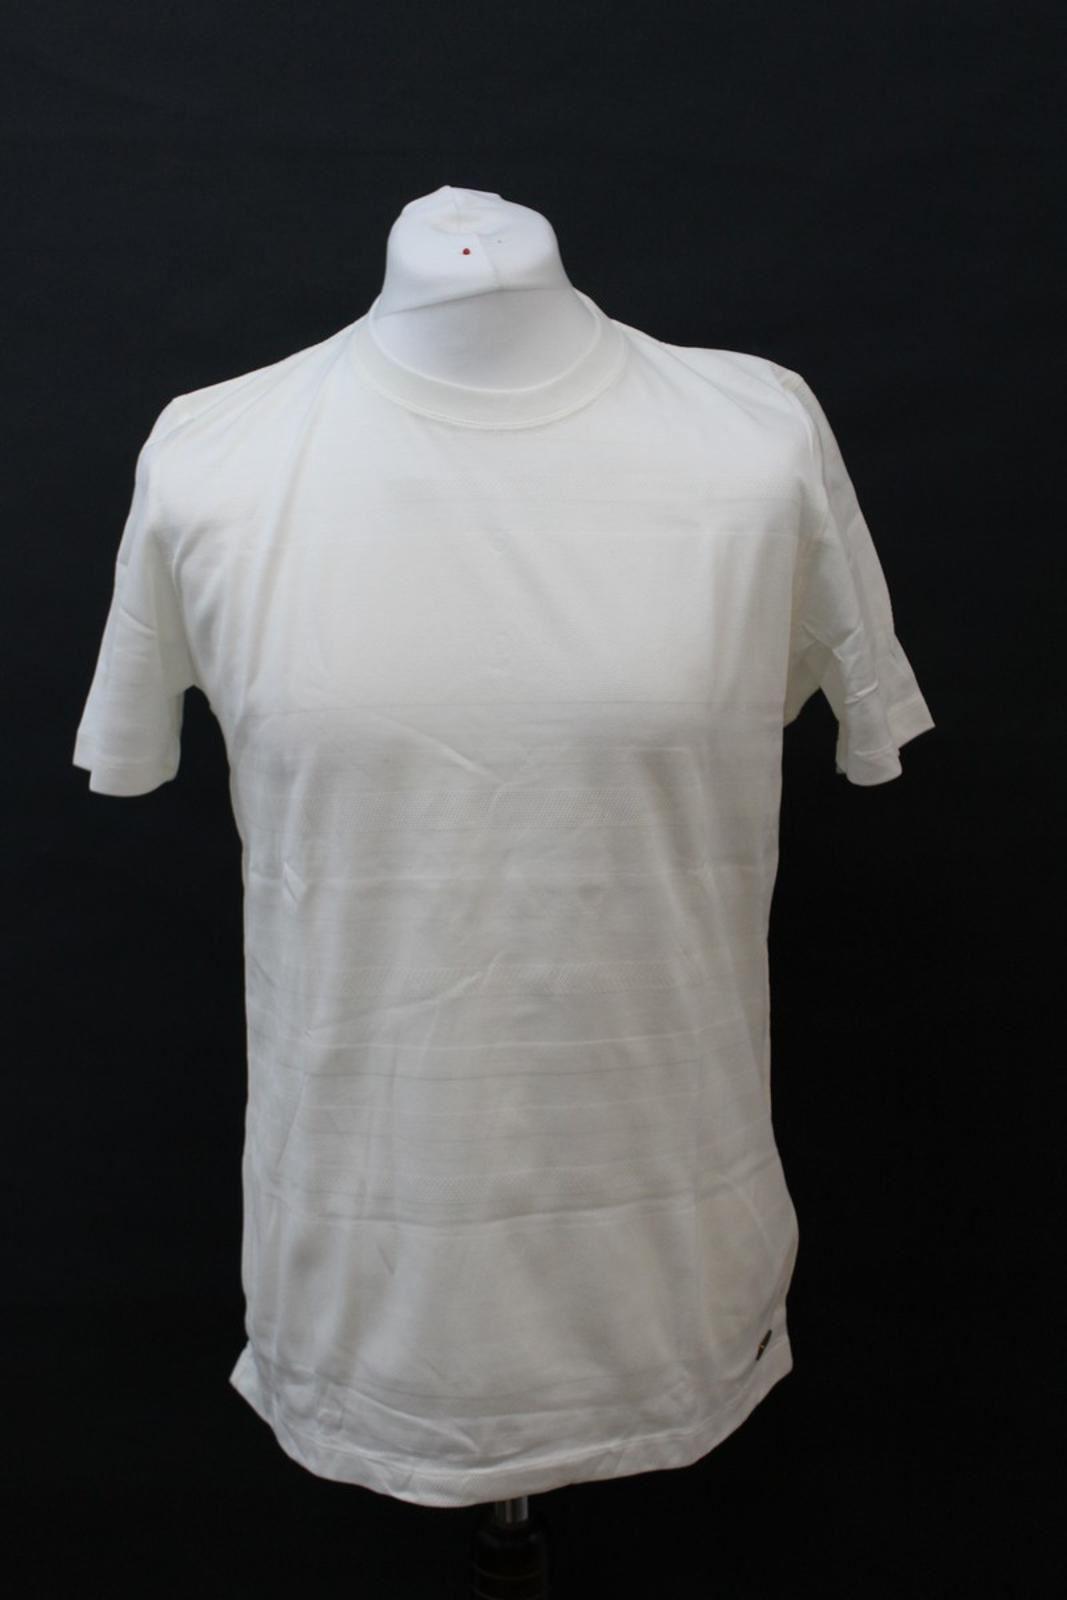 BURBERRY-LONDON-Men-039-s-Ivory-Cotton-Short-Sleeve-Crew-Neck-Striped-T-Shirt-L